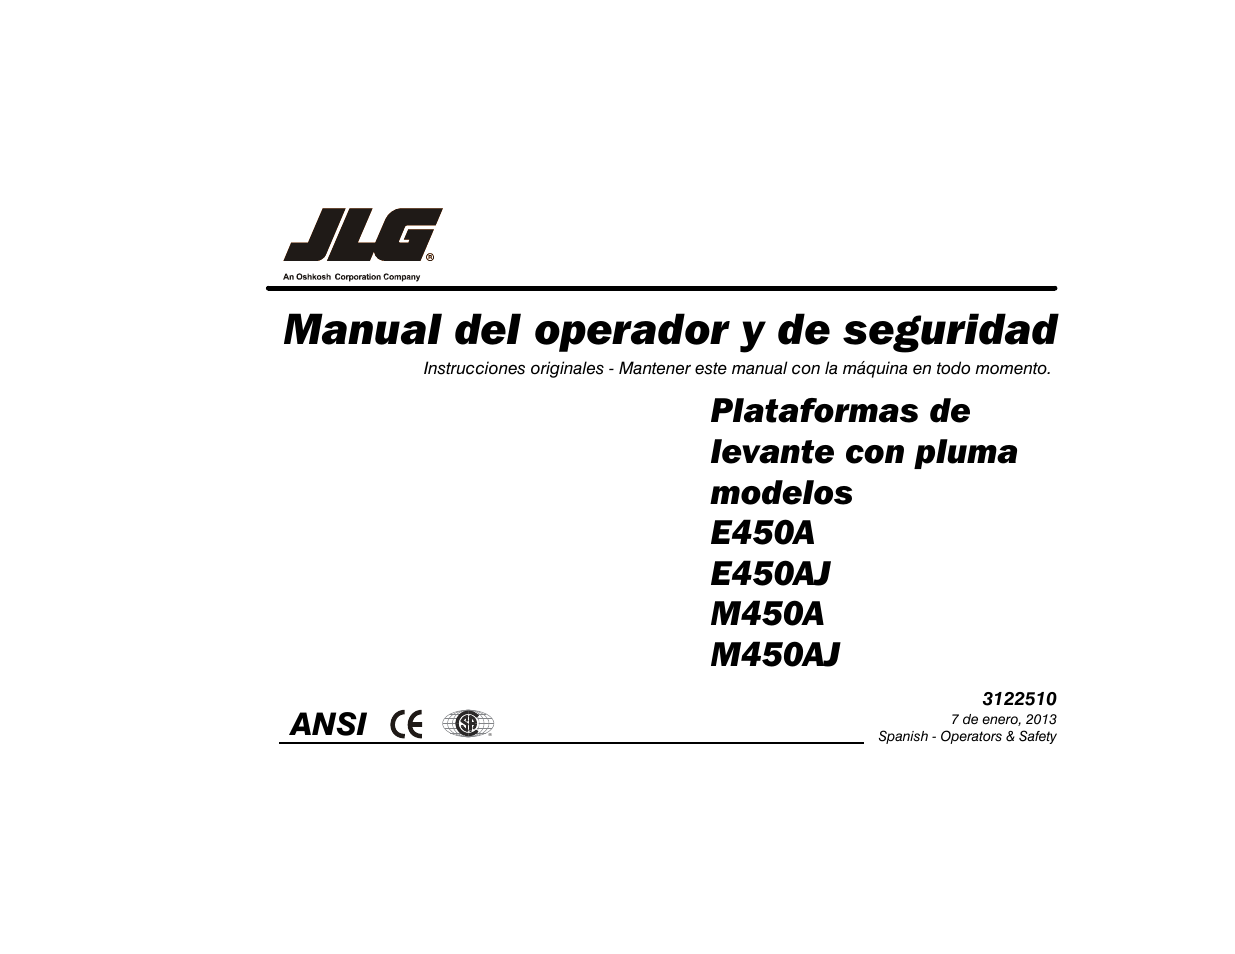 jlg m450 operator manual manual del usuario p u00e1ginas 120 JLG 40H Wiring -Diagram JLG 400S Wiring -Diagram